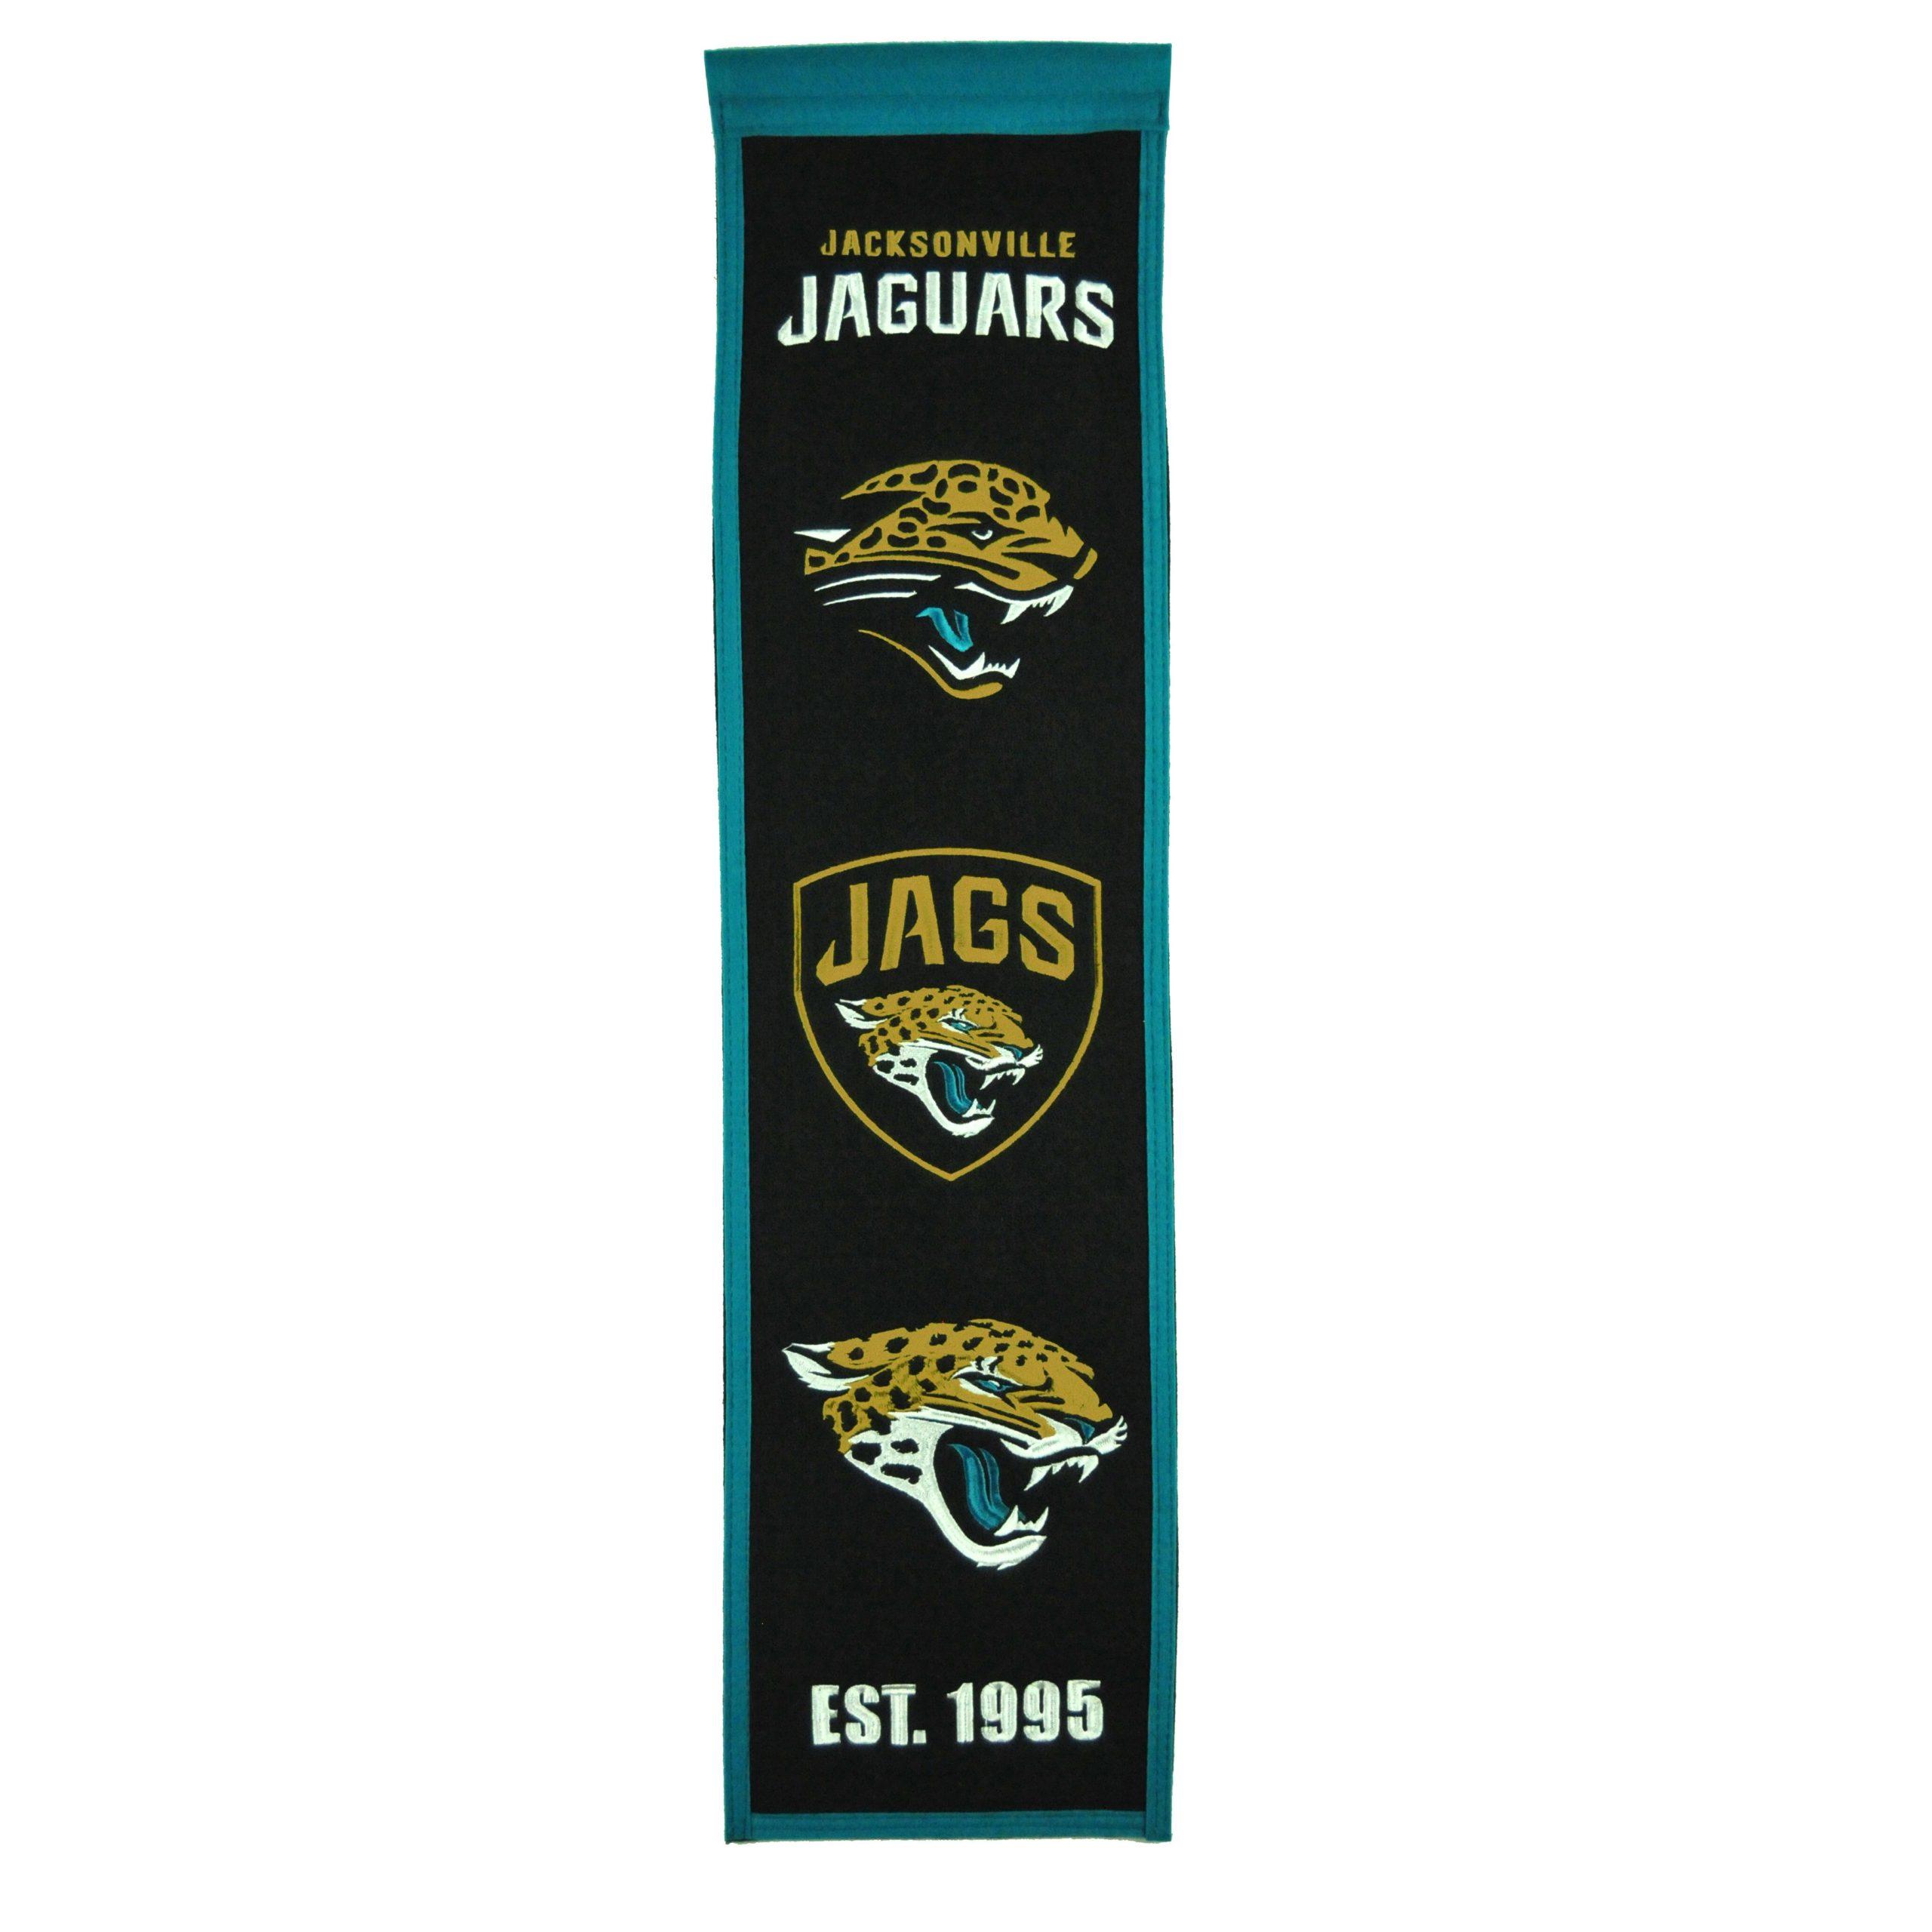 "Jacksonville Jaguars 8"" x 32"" Premium Heritage Banner"